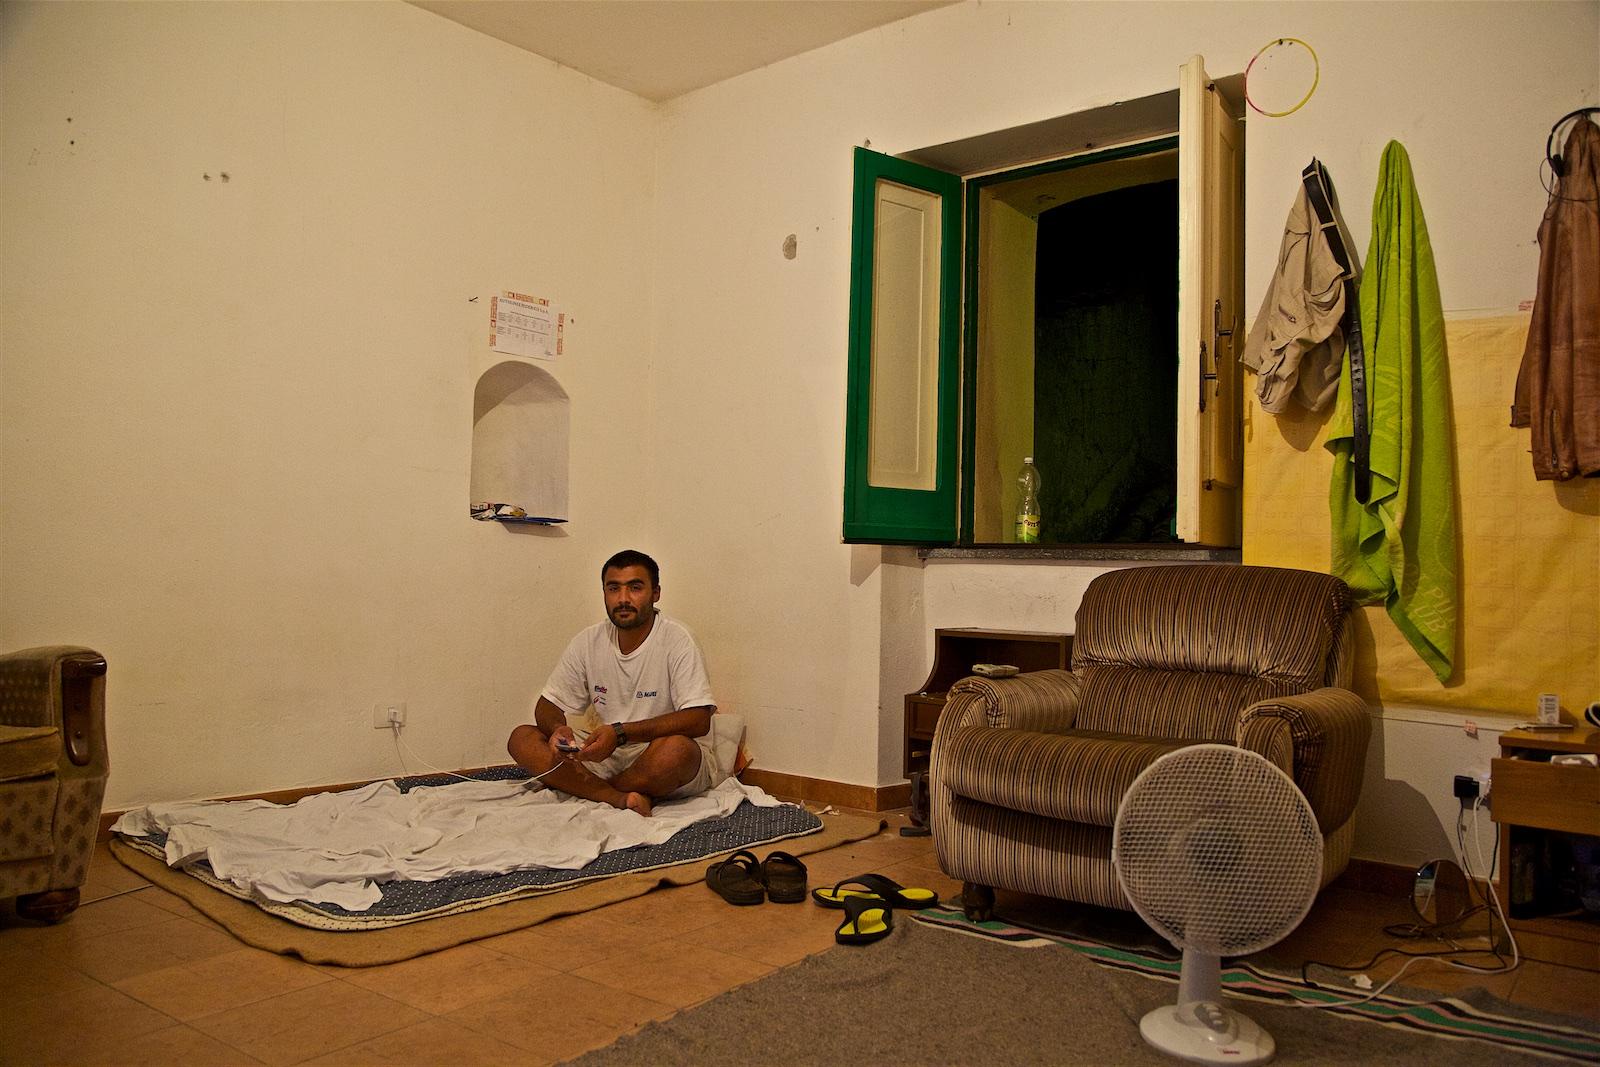 permanently-temporary-refugees-italy-rifugiati-italia-denis-bosnic-photography-portraits-7+(1).jpg